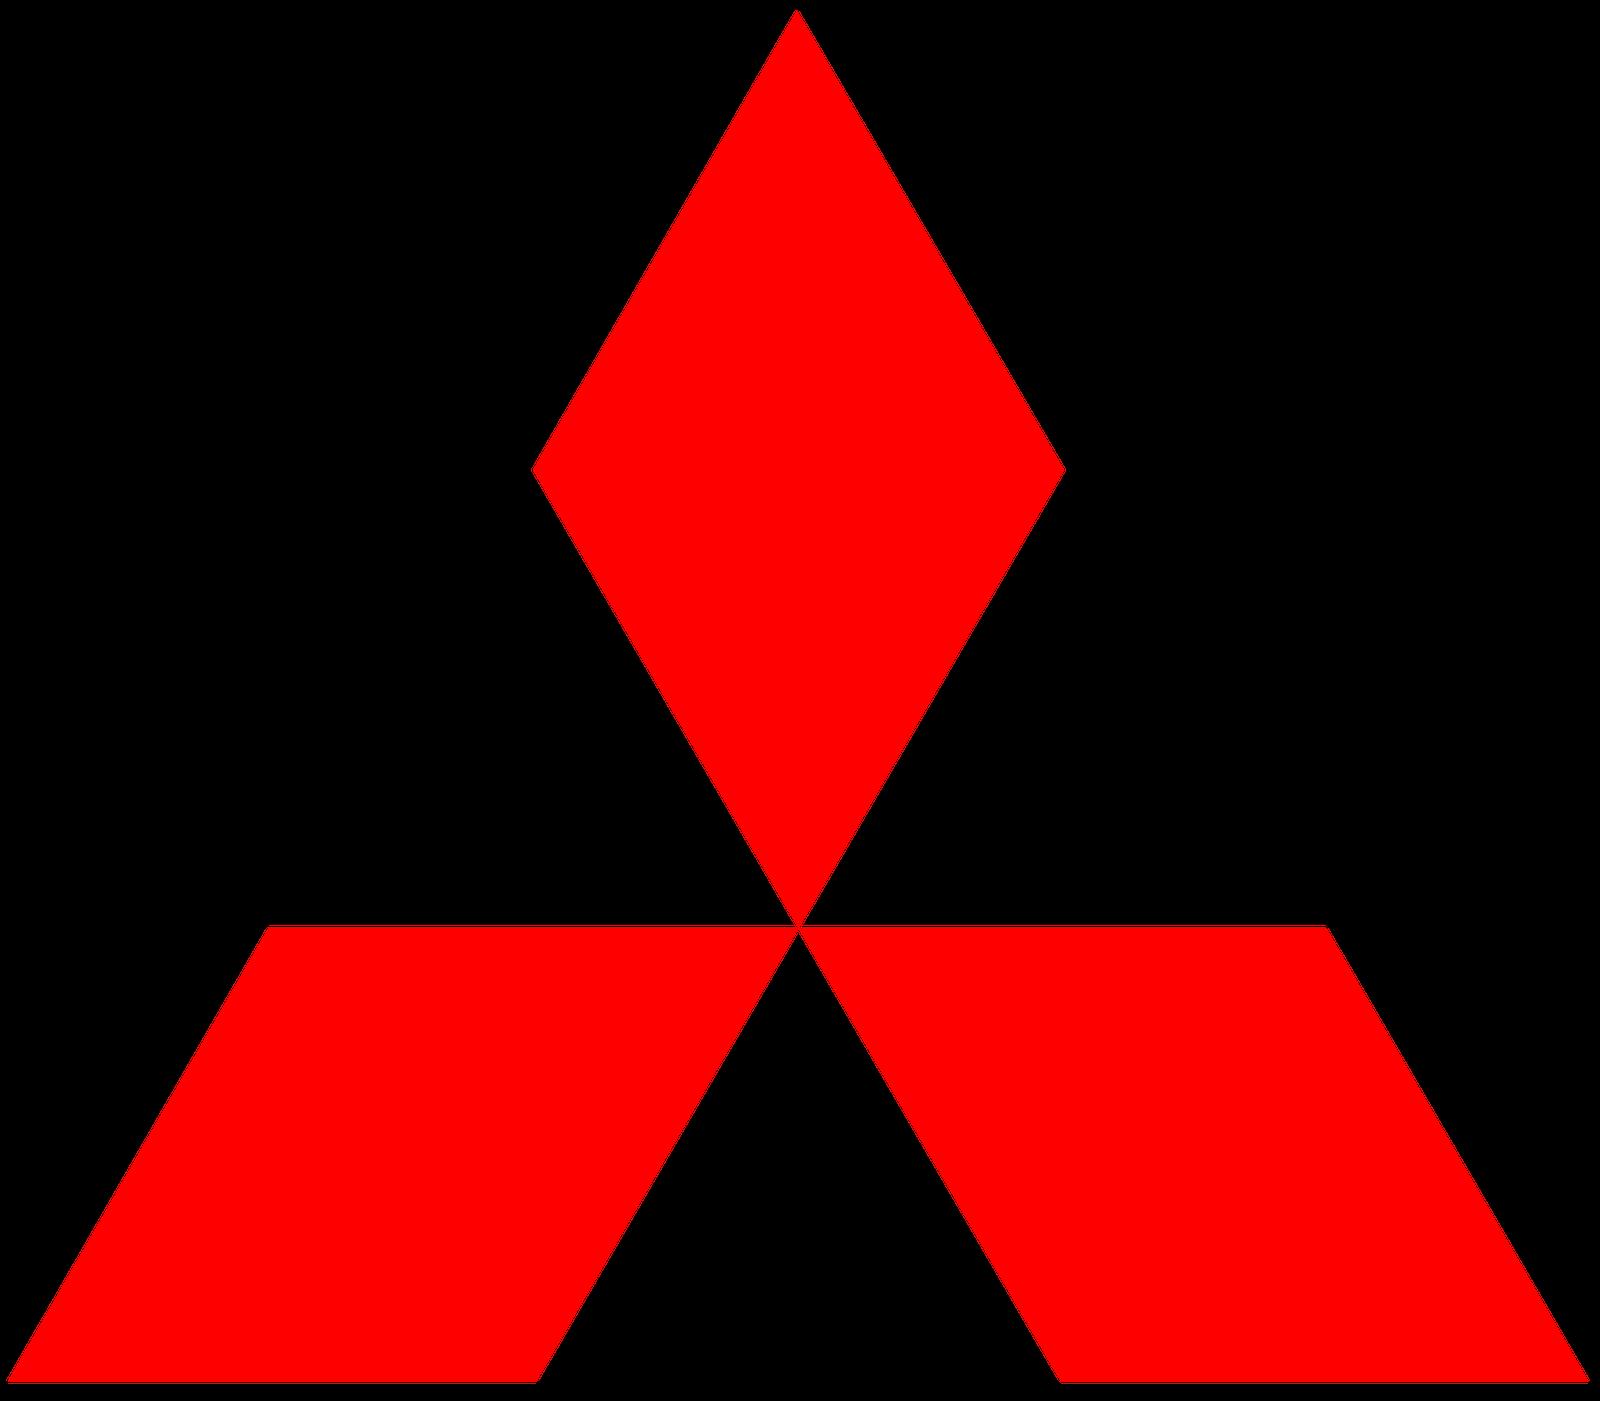 Митсубиши PNG логотип, Mitsubishi car logo PNG